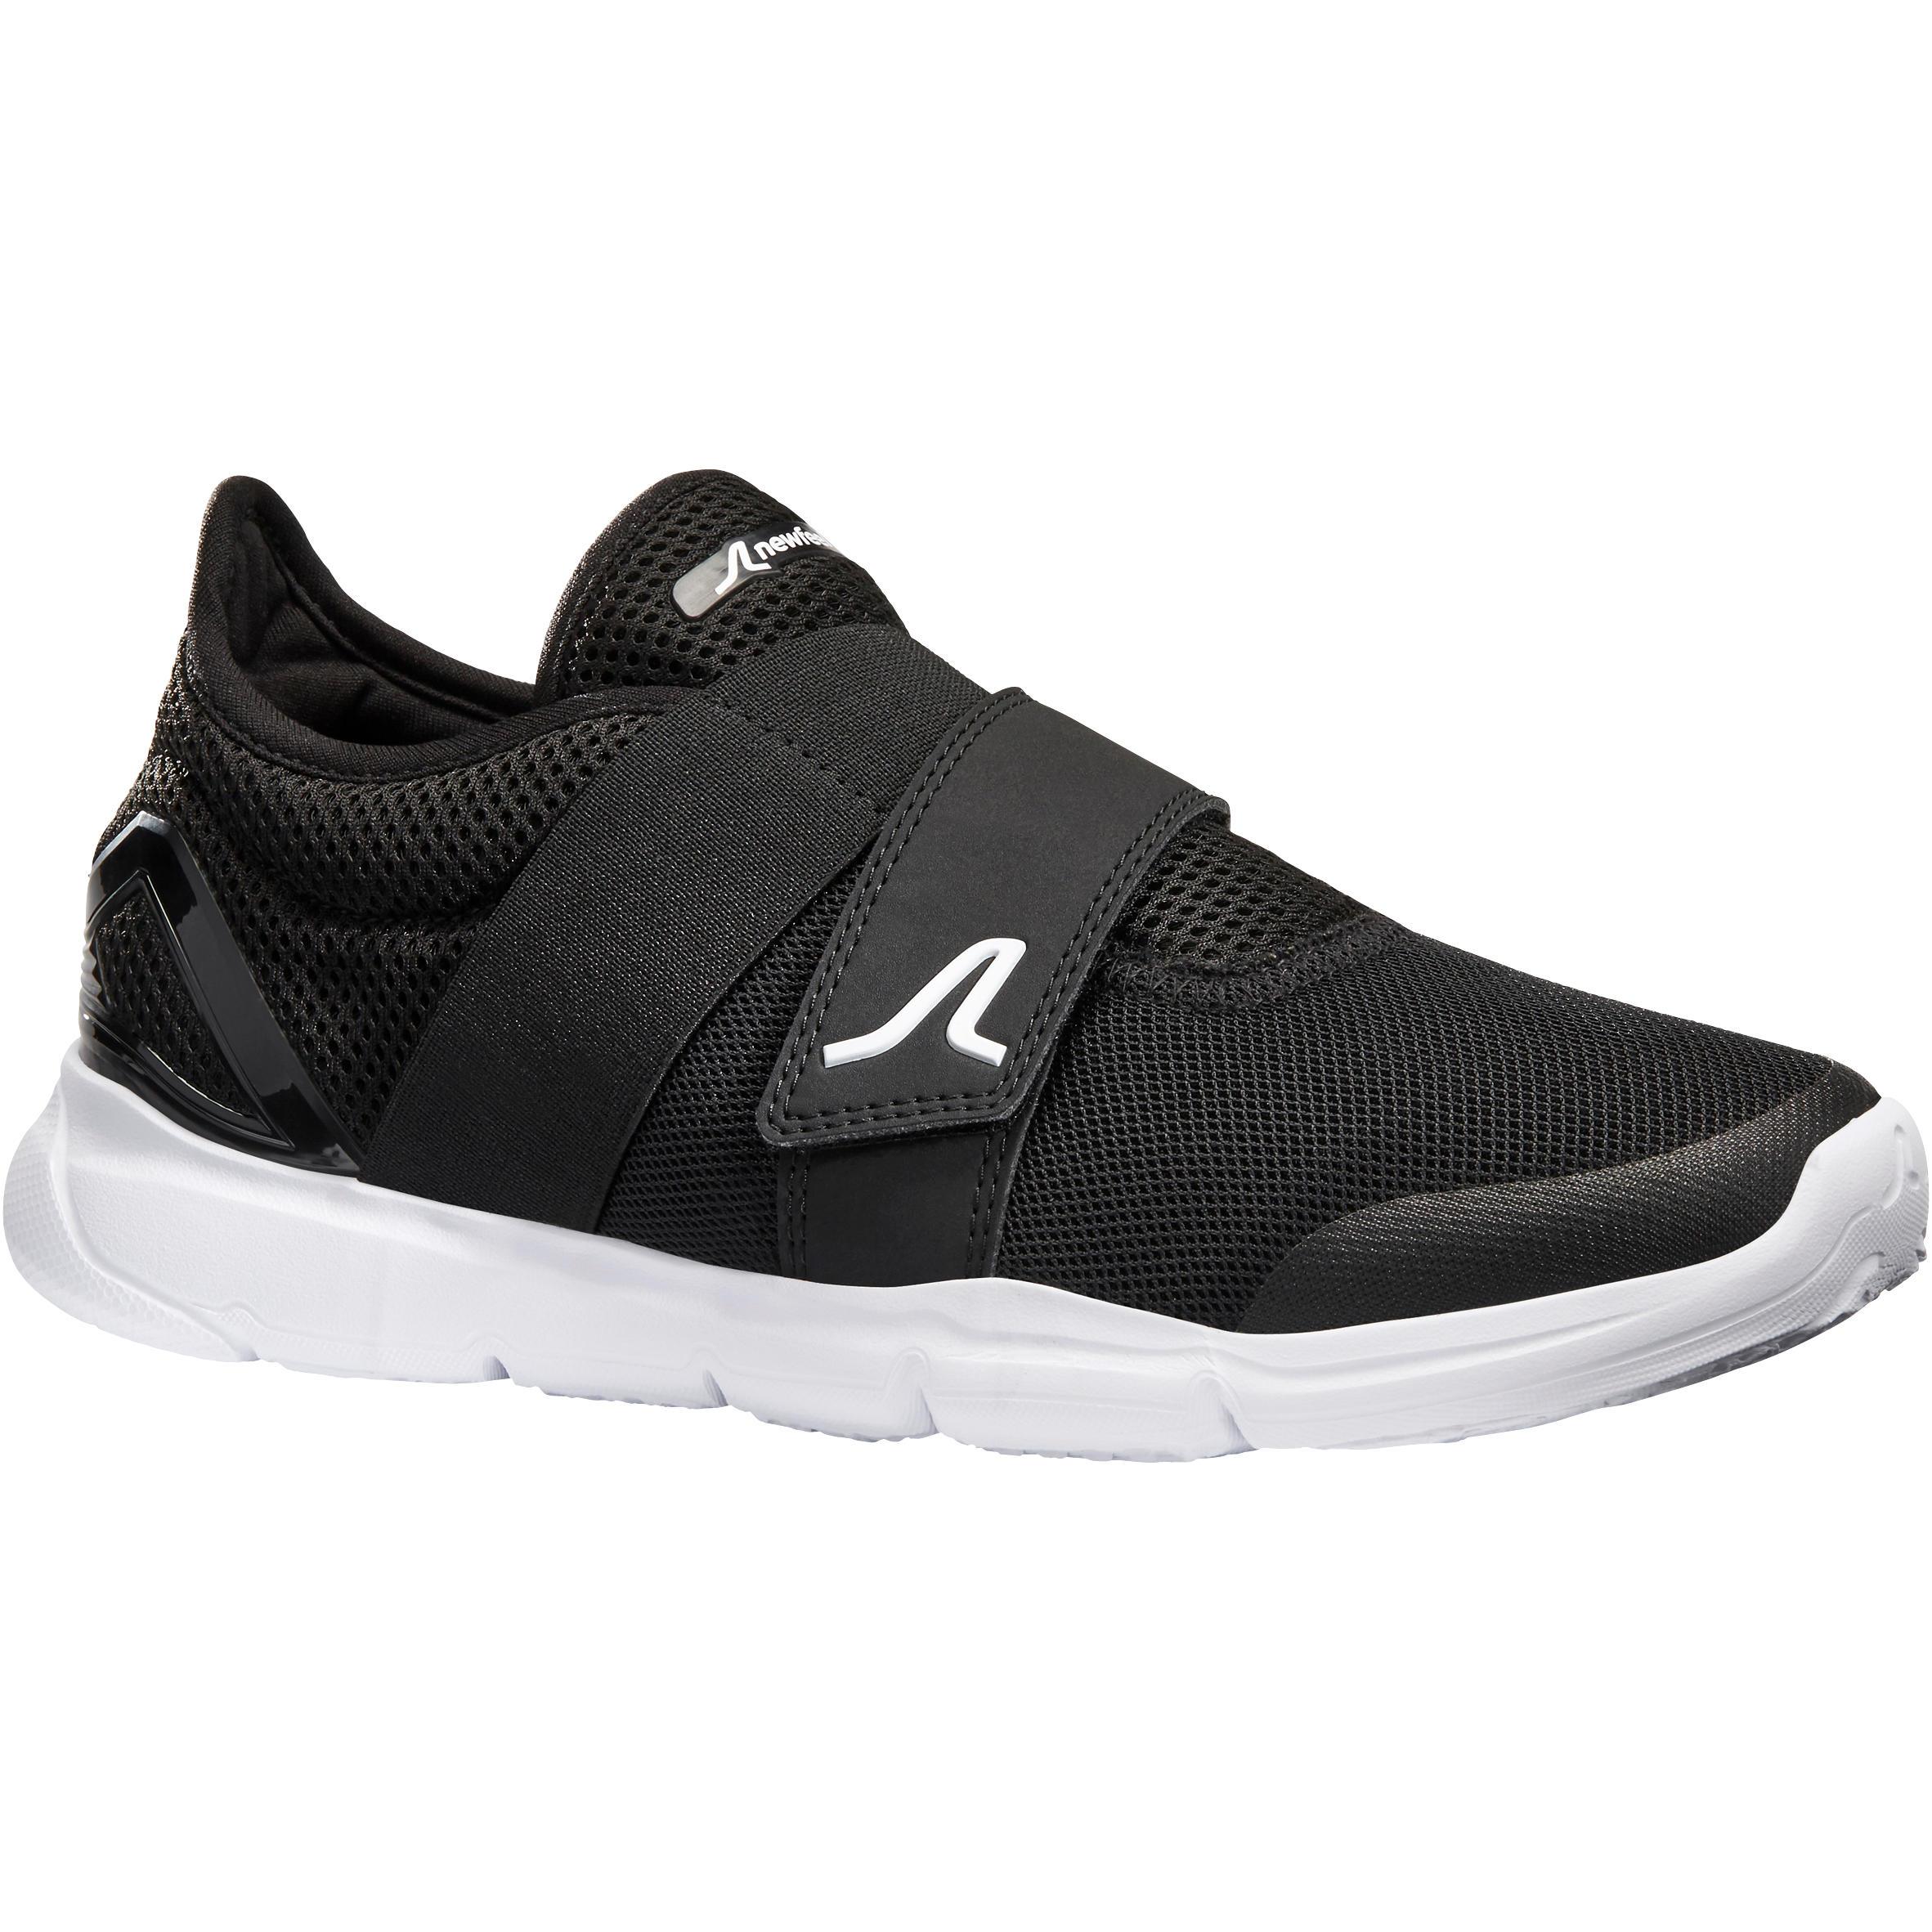 760a07f1f0e5 Comprar Zapatillas de Andar para Mujer | Decathlon